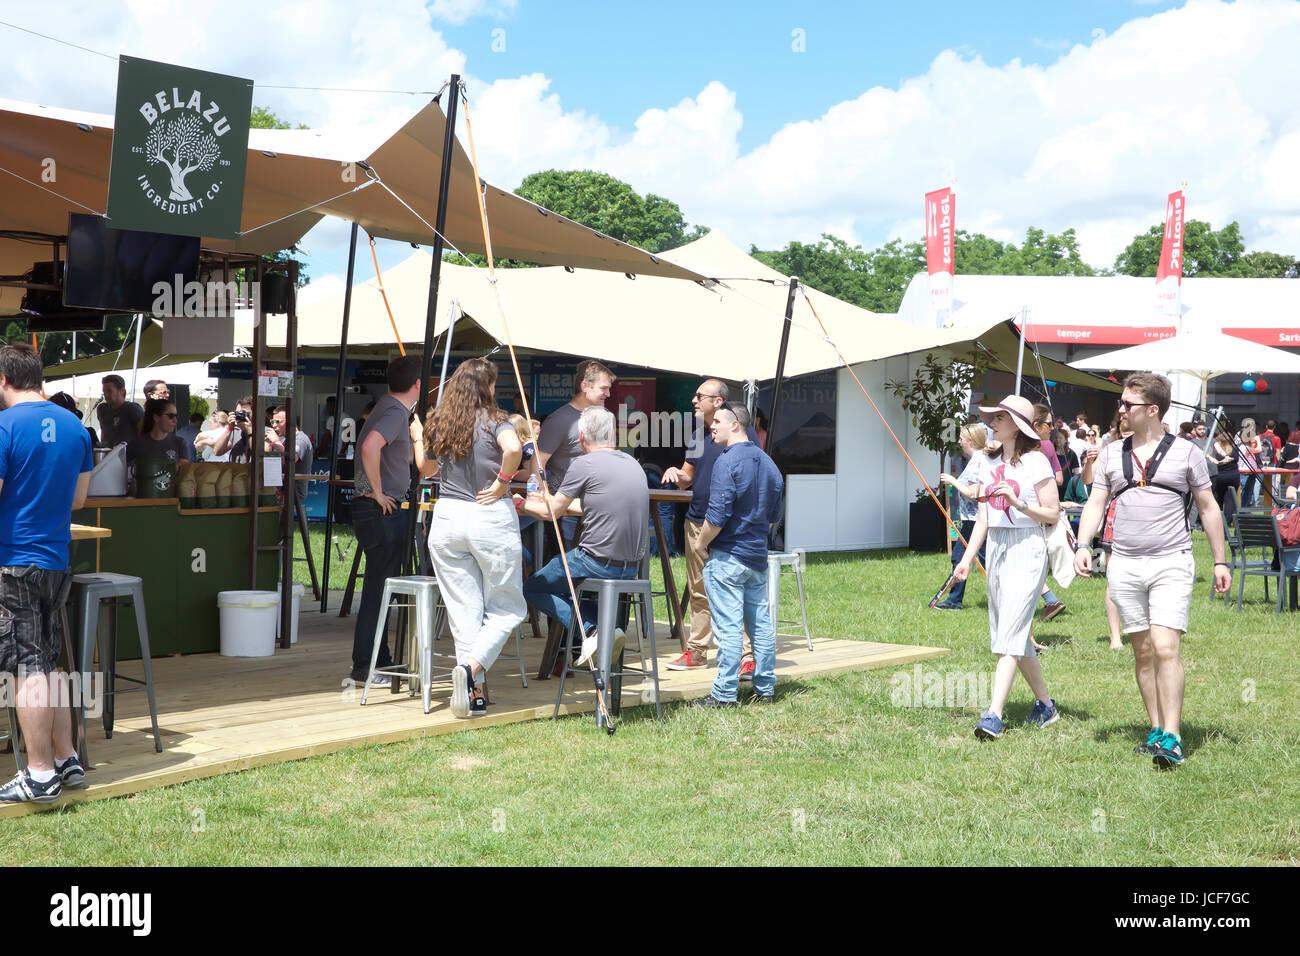 London, UK. 15th June, 2017. Taste of London takes place in Regents Park. Taste of London is the definitive showcase - Stock Image